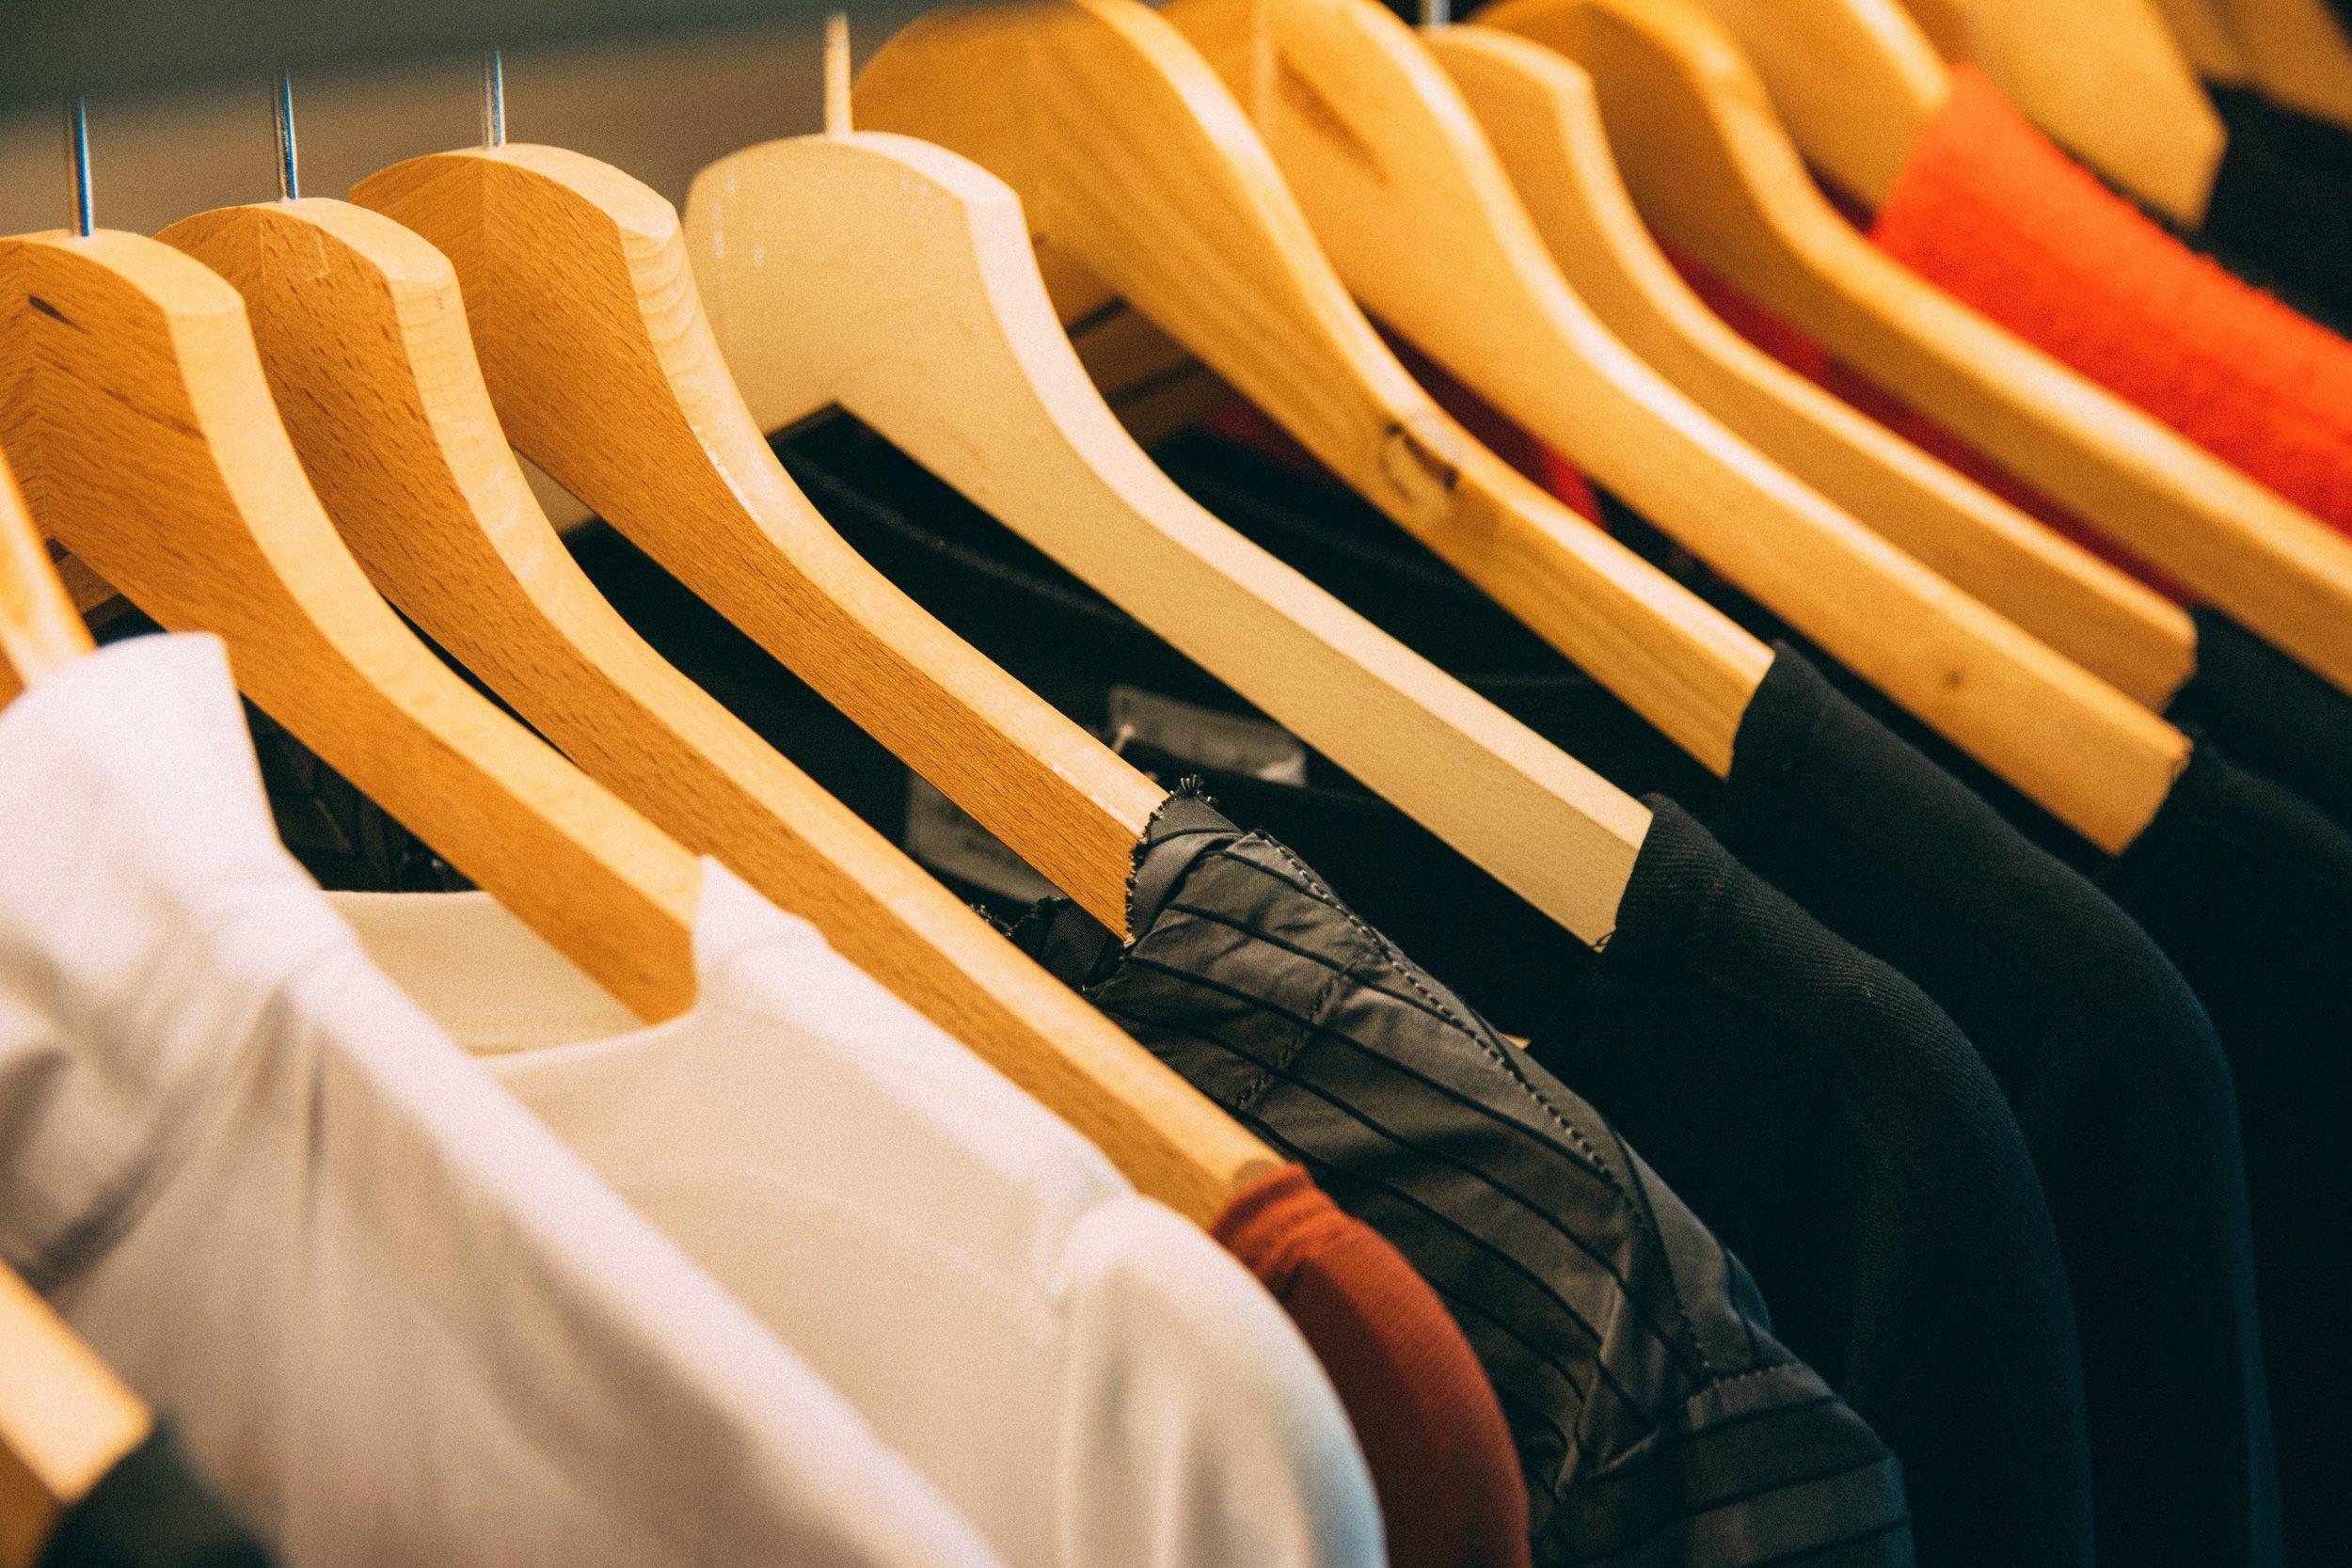 cabinet-clothes-clothes-hanger-996329.jpg